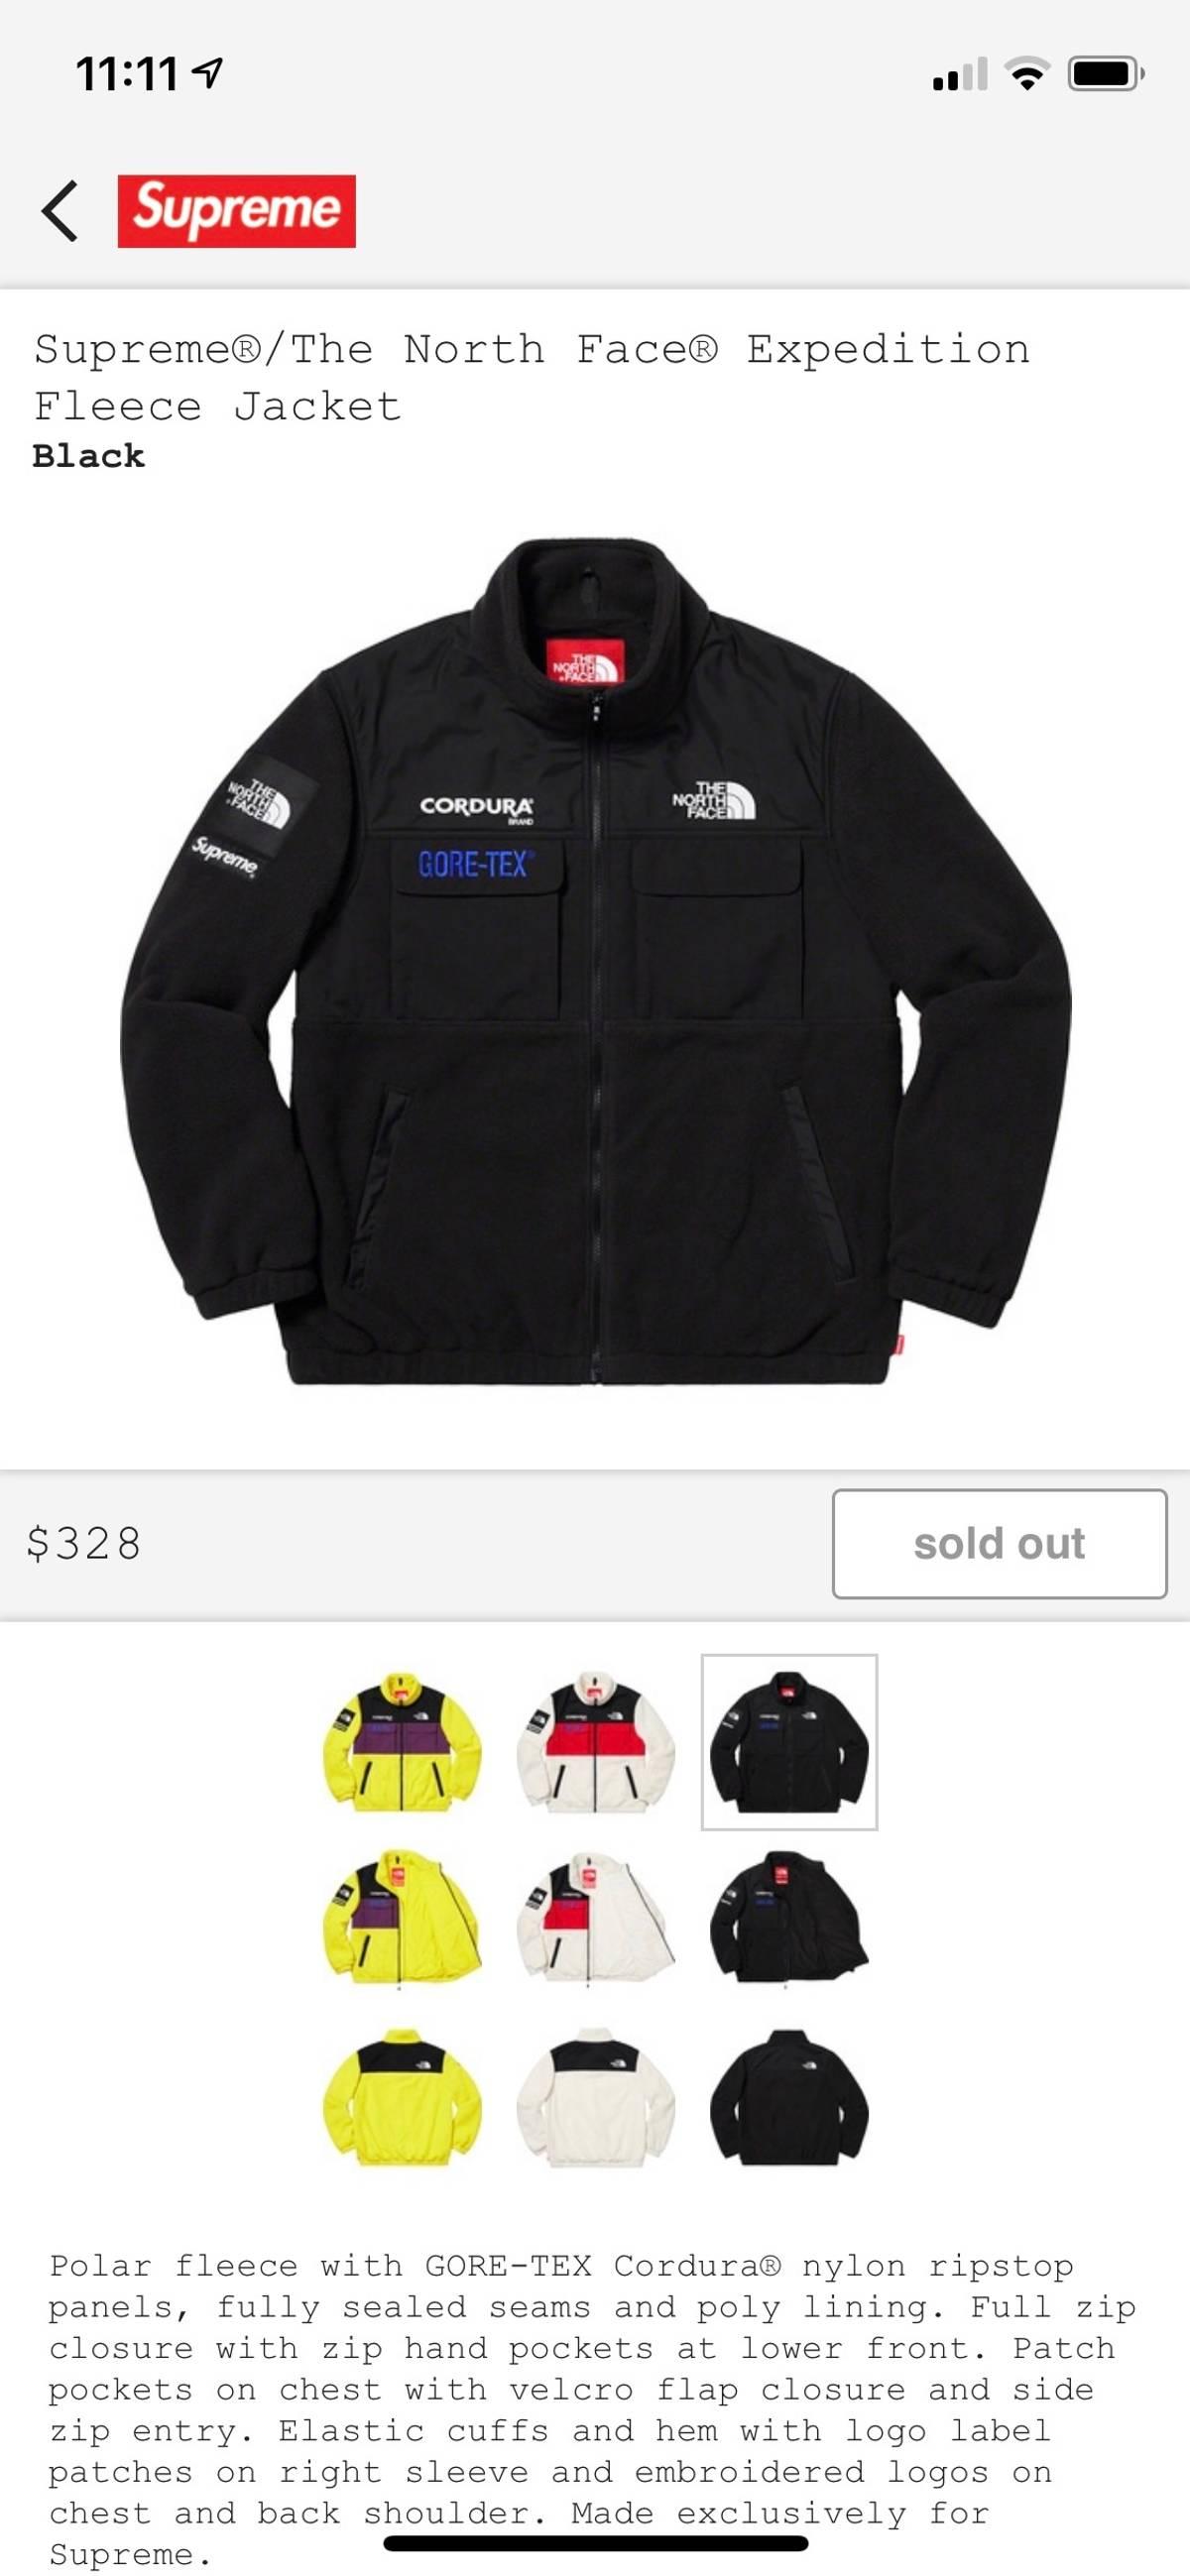 Supreme Supreme X The North face Expedition Fleece Jacket Black Size m -  Light Jackets for Sale - Grailed 4e1ee5ebb